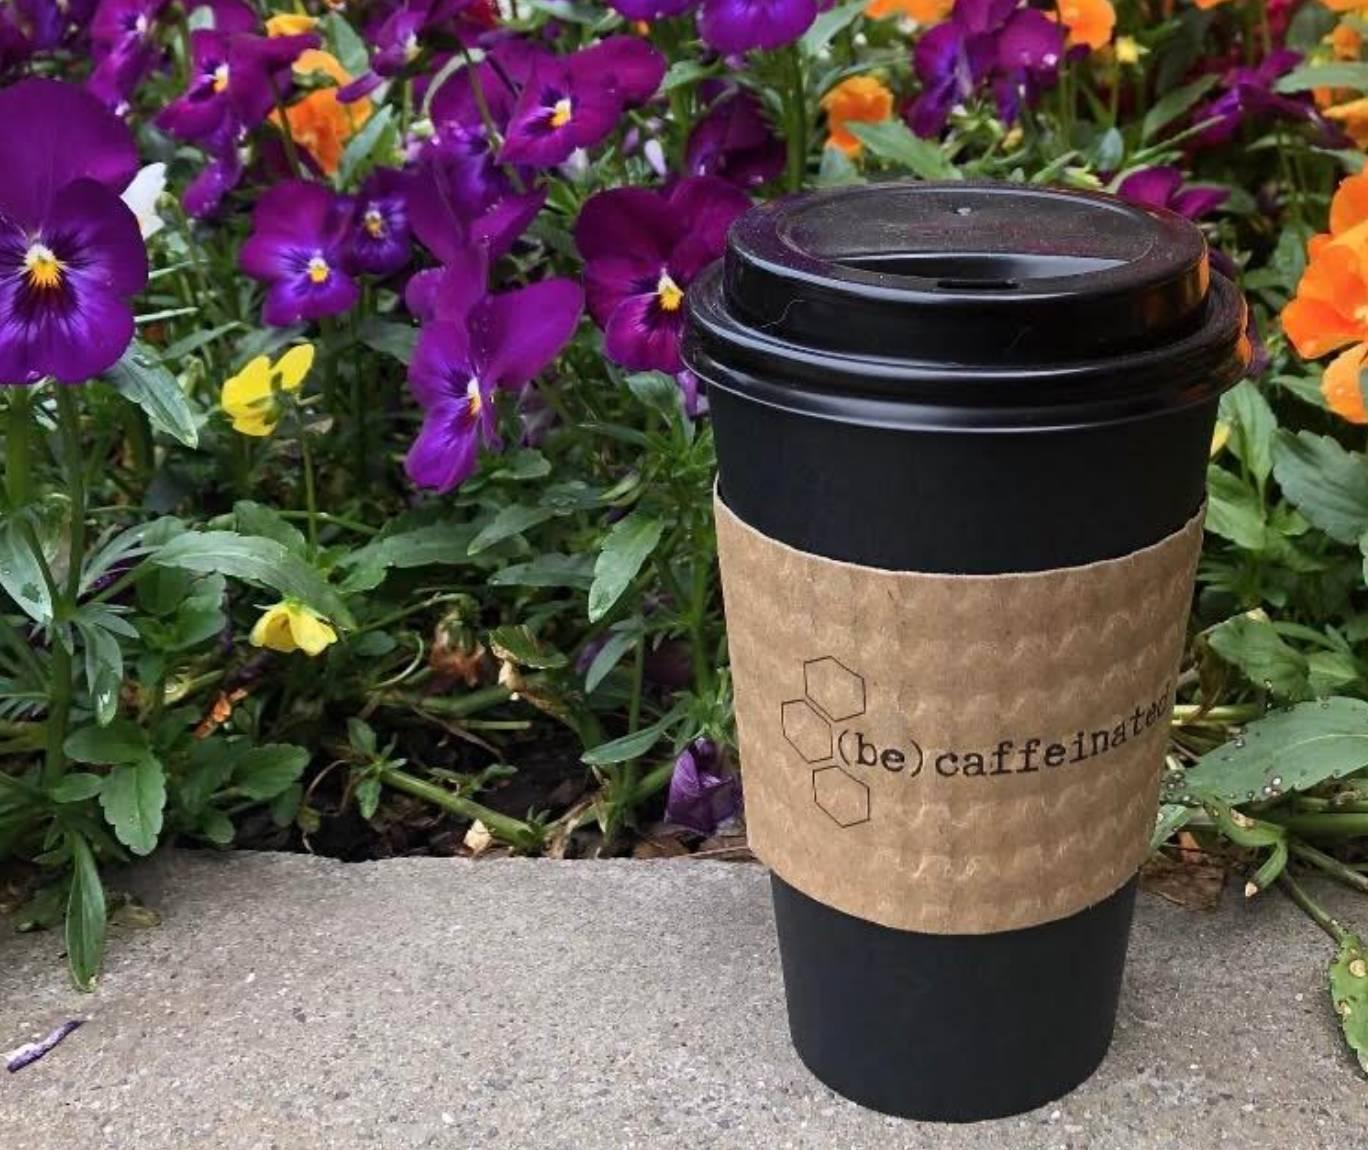 Drive Thru Coffee To Go